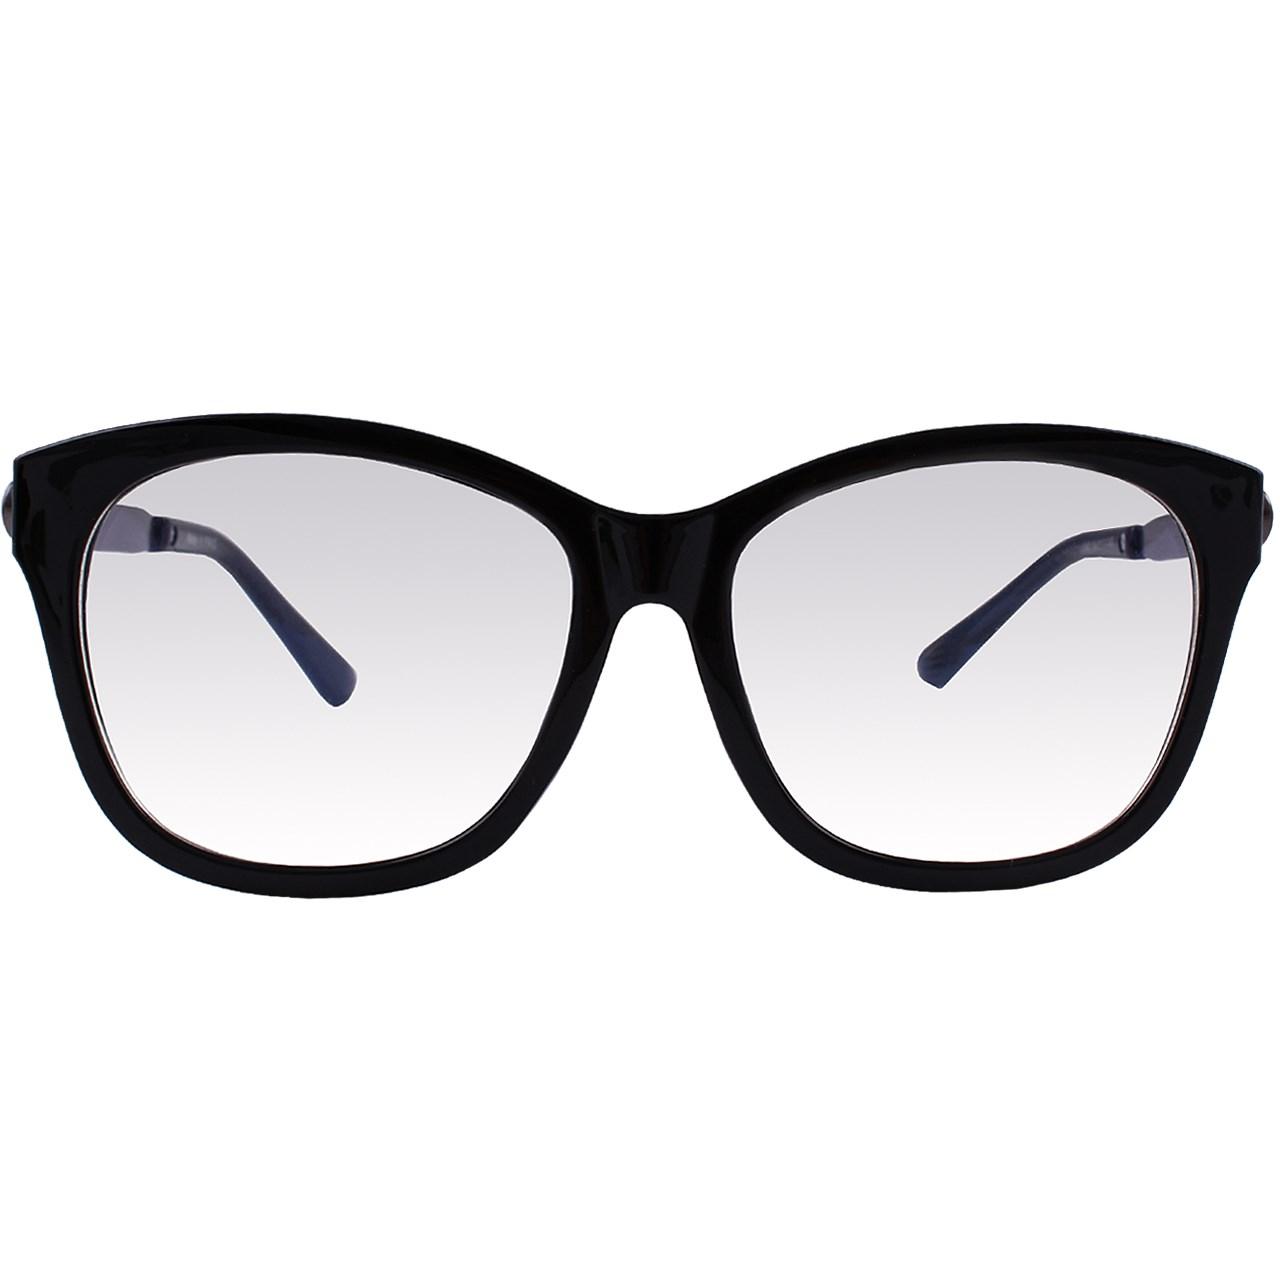 فریم عینک واته مدل 540GR